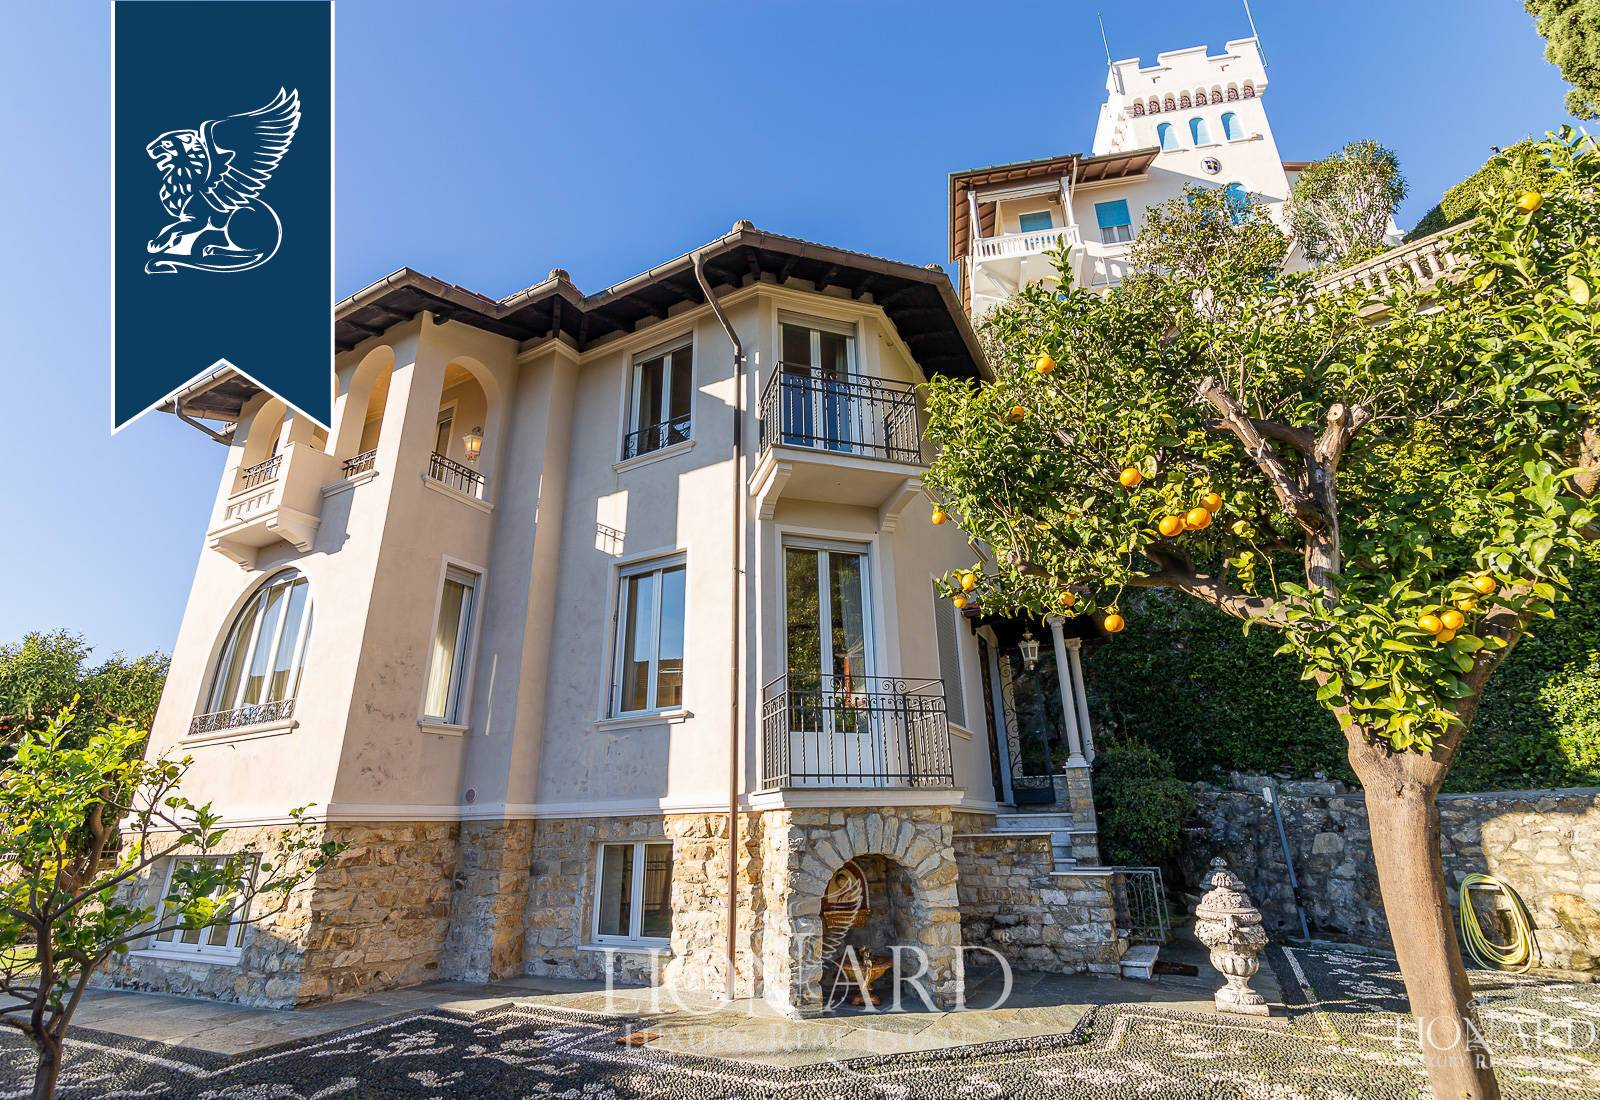 Villa in Vendita a Santa Margherita Ligure: 0 locali, 350 mq - Foto 4